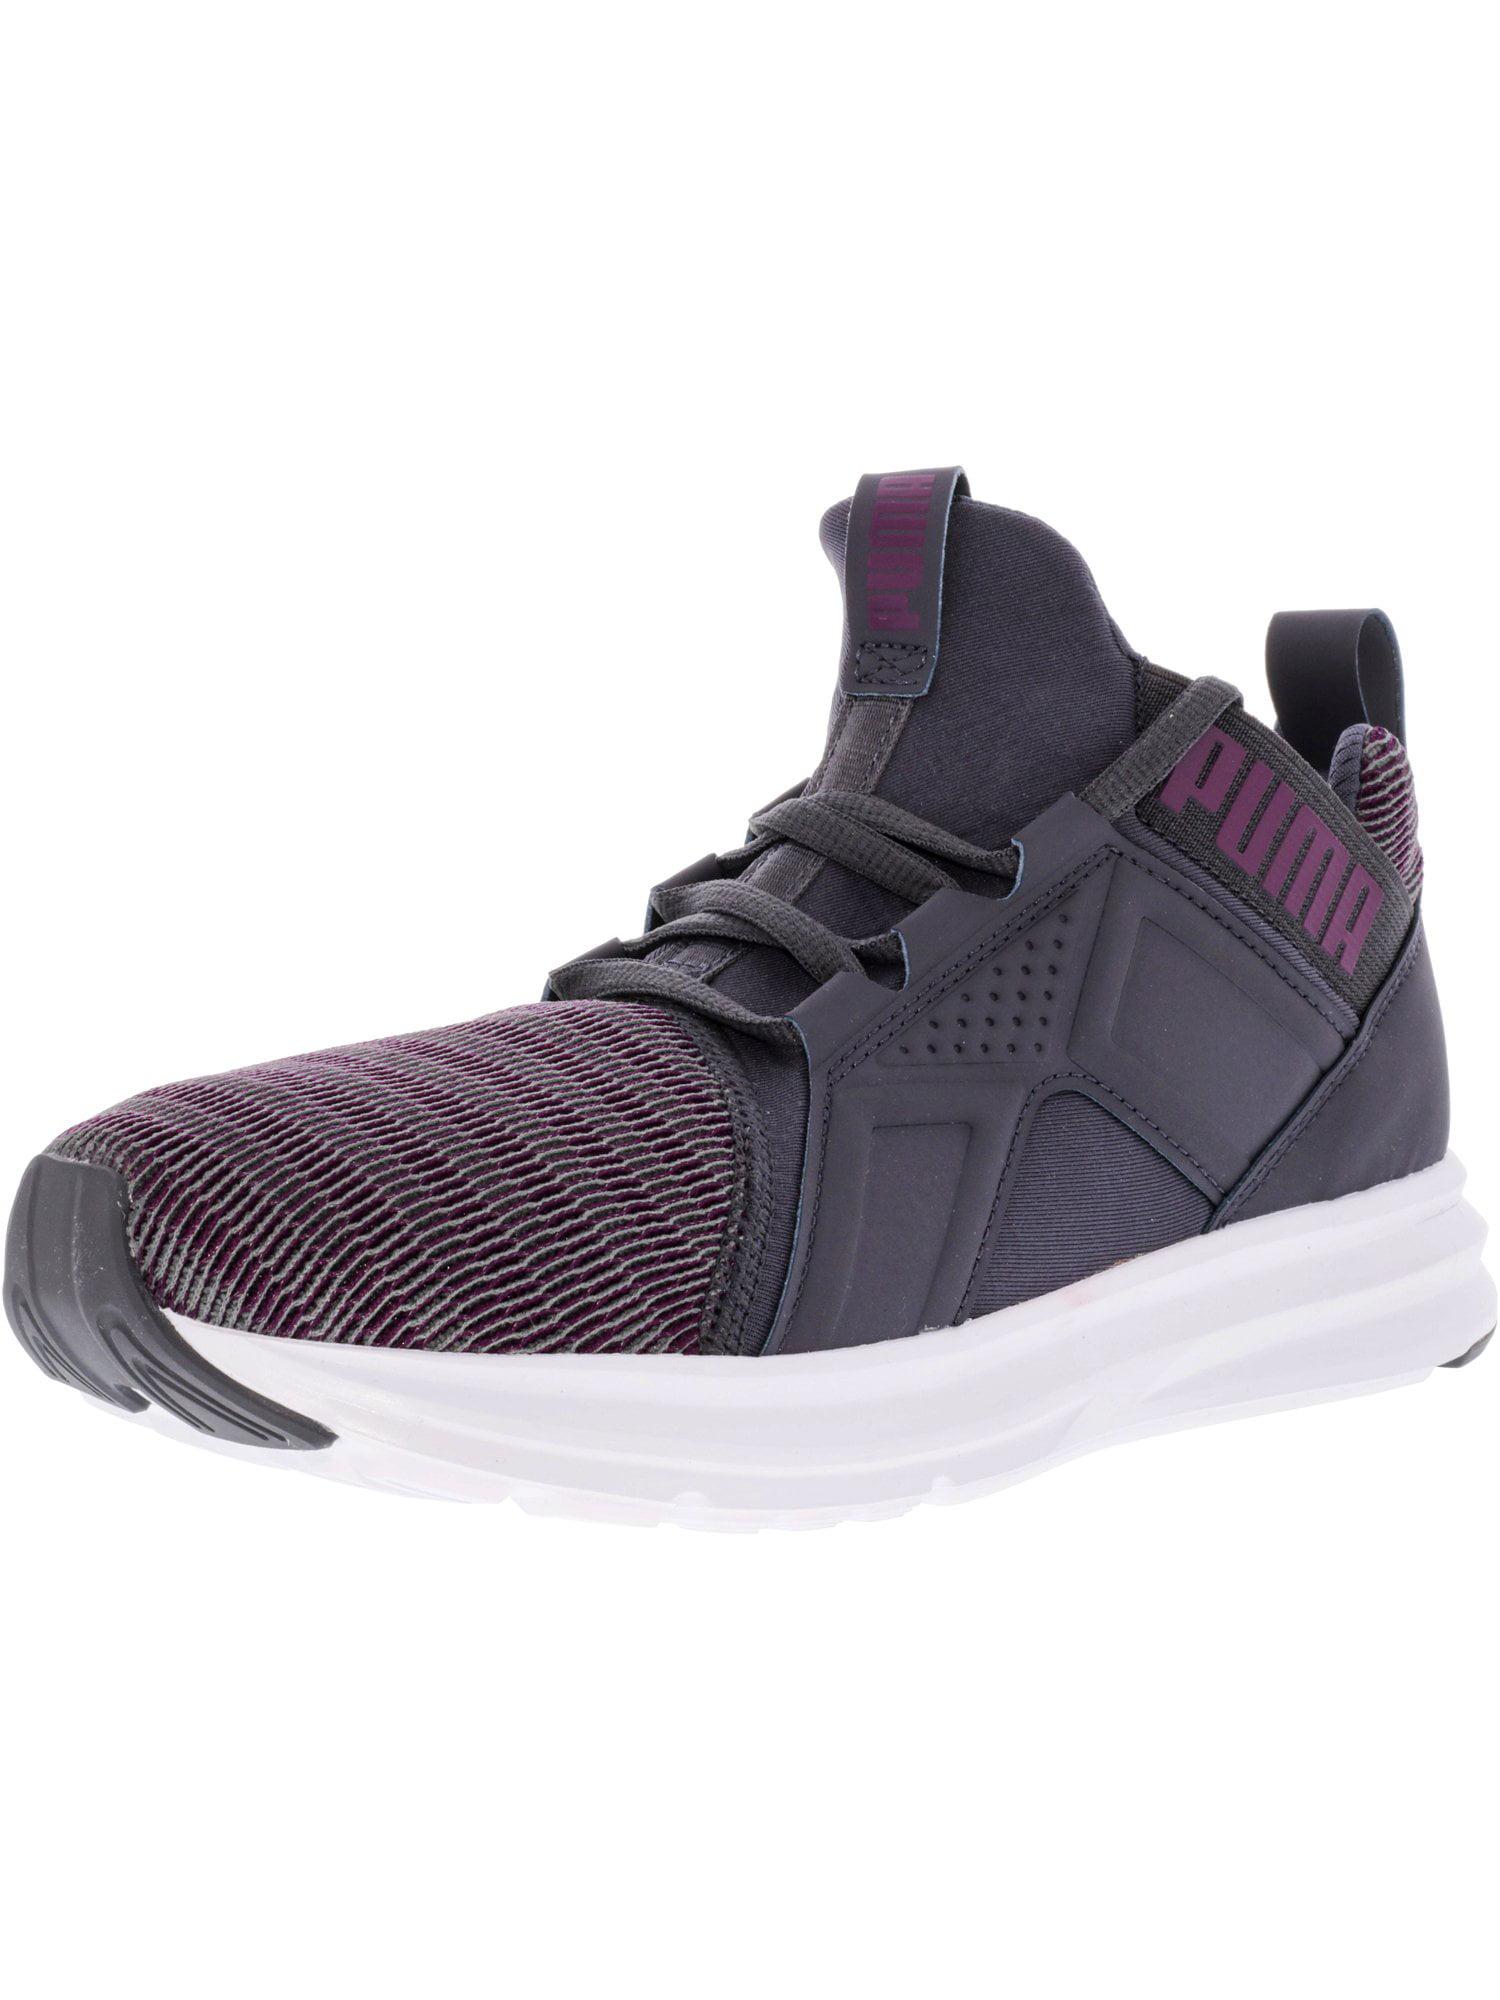 Puma Women's Dark Enzo Colorshift Periscope / Dark Women's Purple Ankle-High Fashion Sneaker - 7.5M b94938